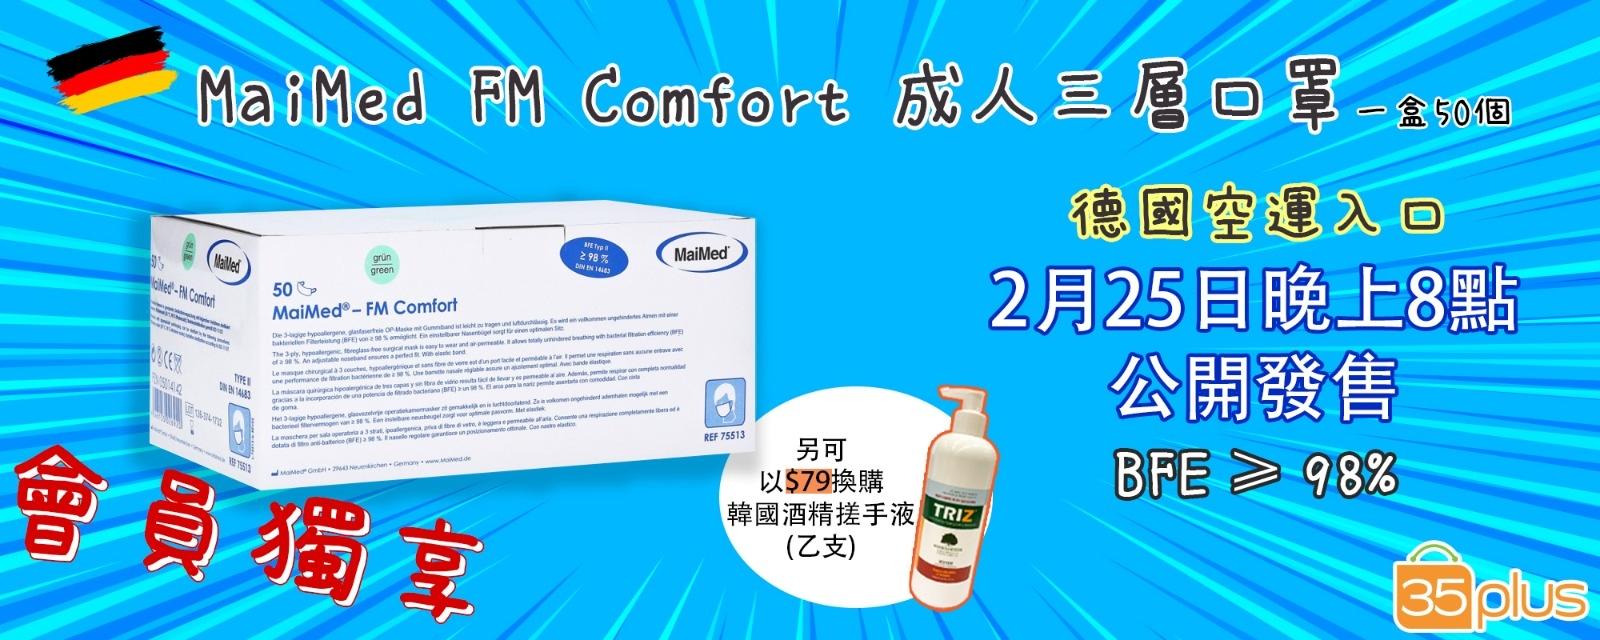 MaiMed FM Comfort 三層口罩 50片/盒 (BFE) ≥ 98%, type II (藍色)